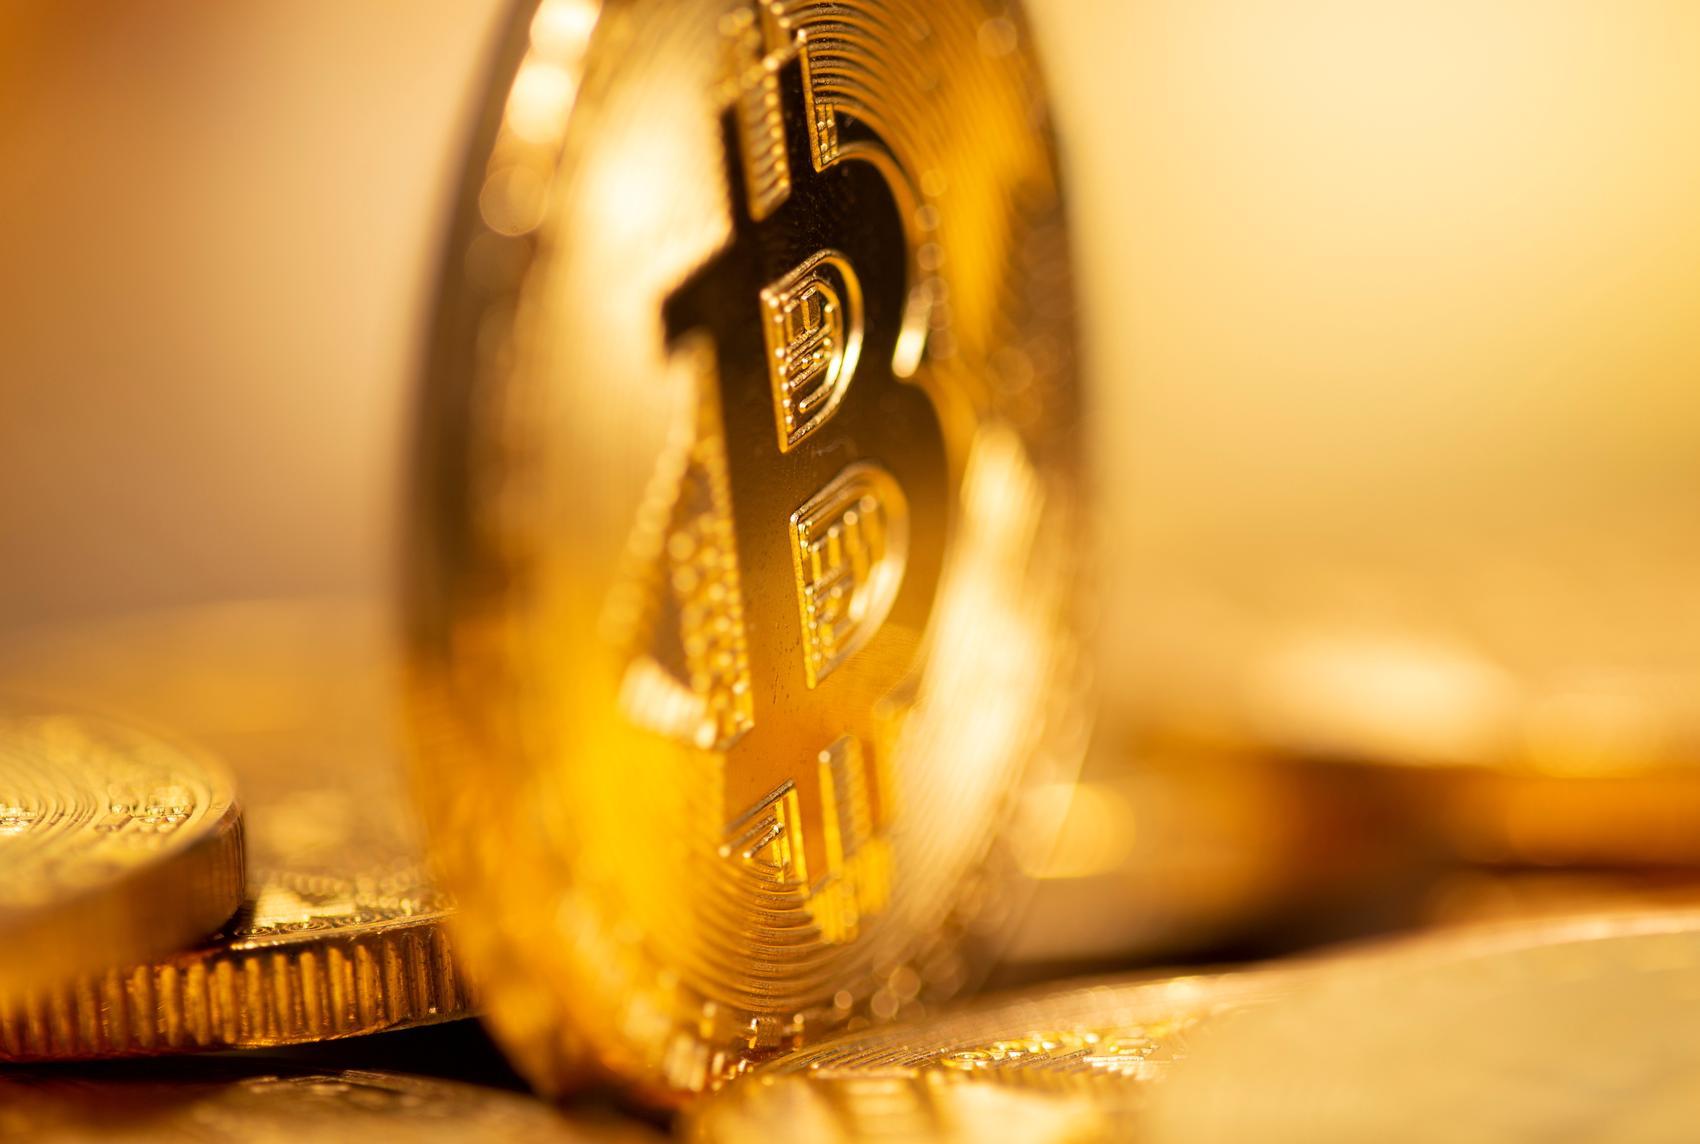 British fund firm Ruffer has 550 million pounds bitcoin bet - spokesman